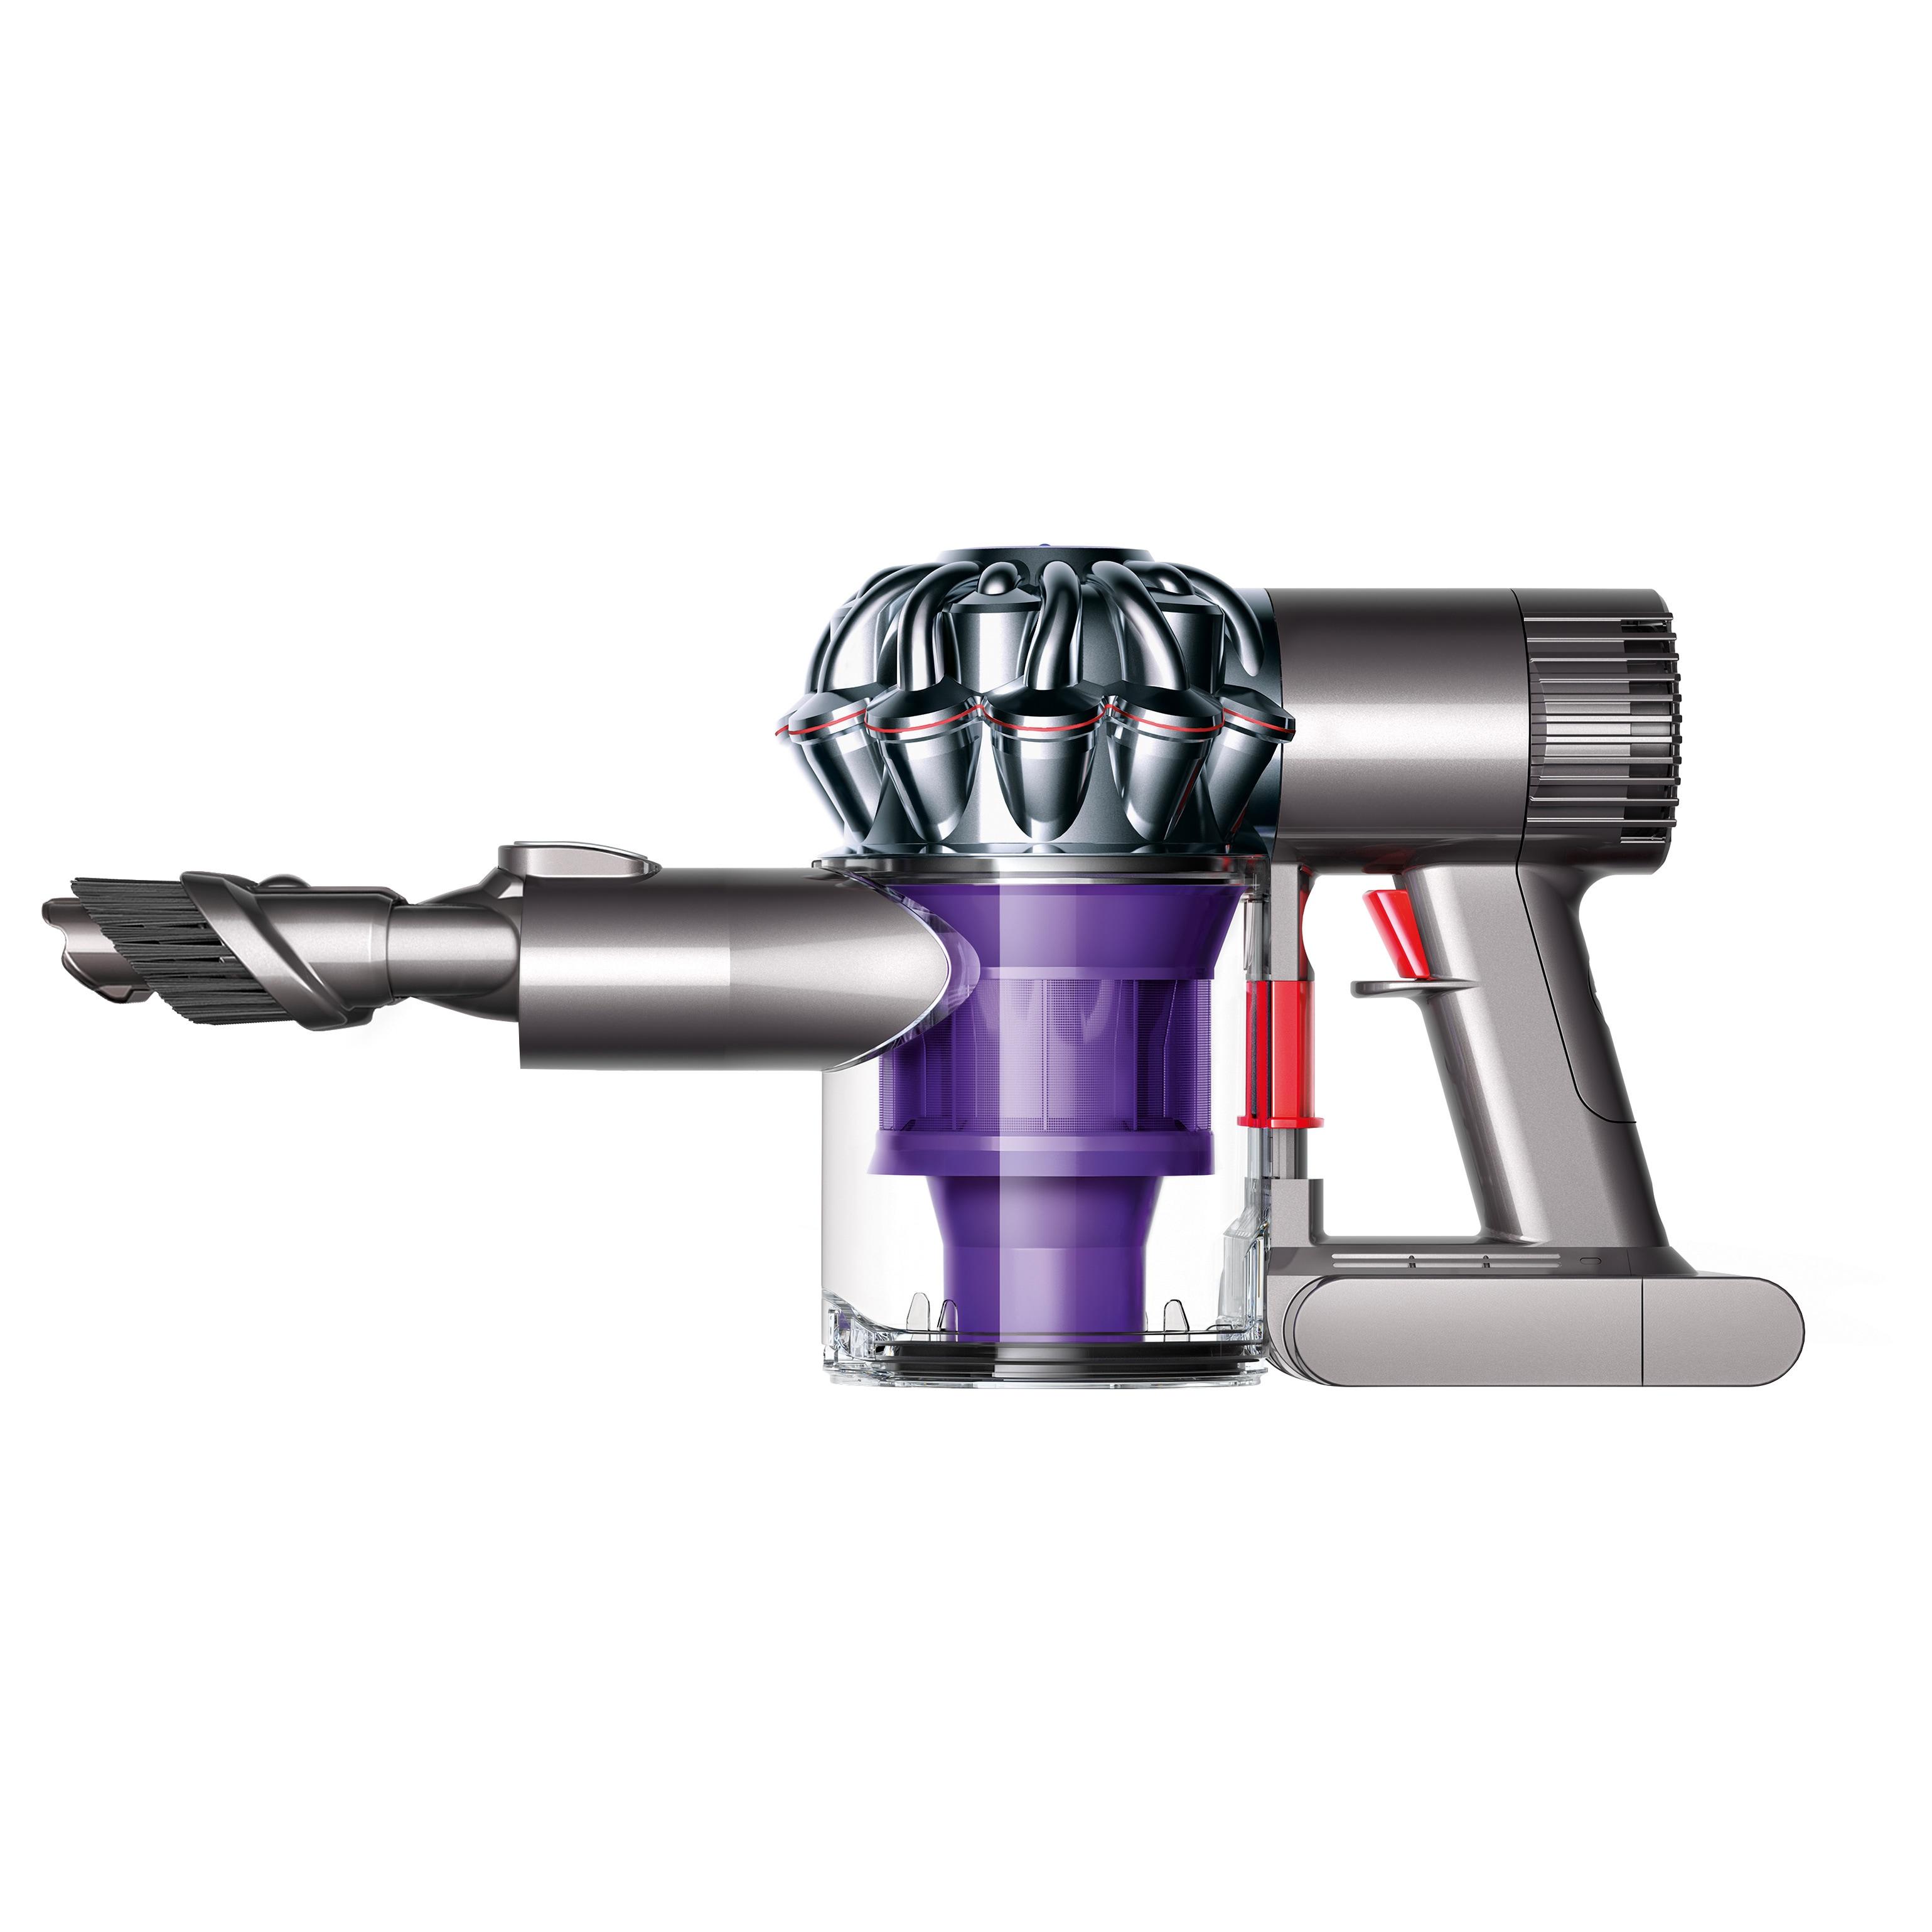 Dyson V6 Trigger Handheld Vacuum (New) (DC58 Handheld), Grey